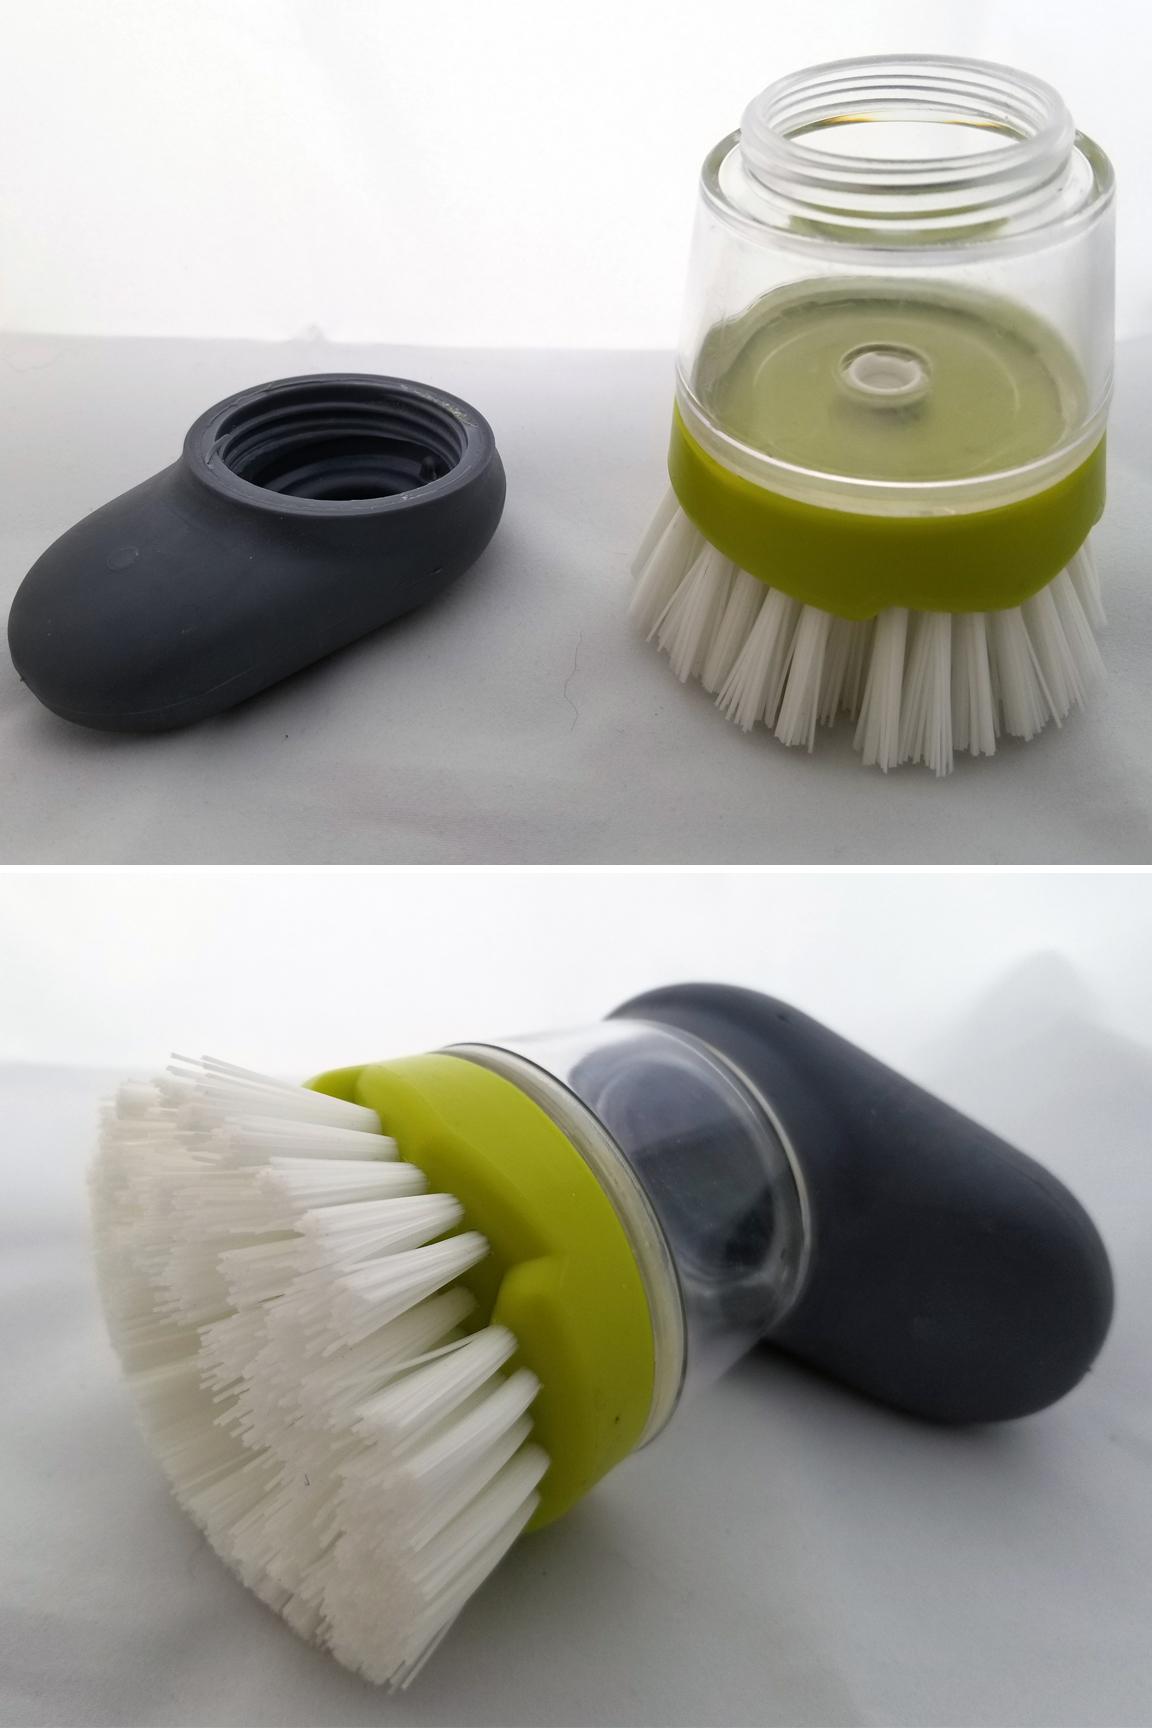 Large capacity soap reservoir. Replaceable scrub brush head.